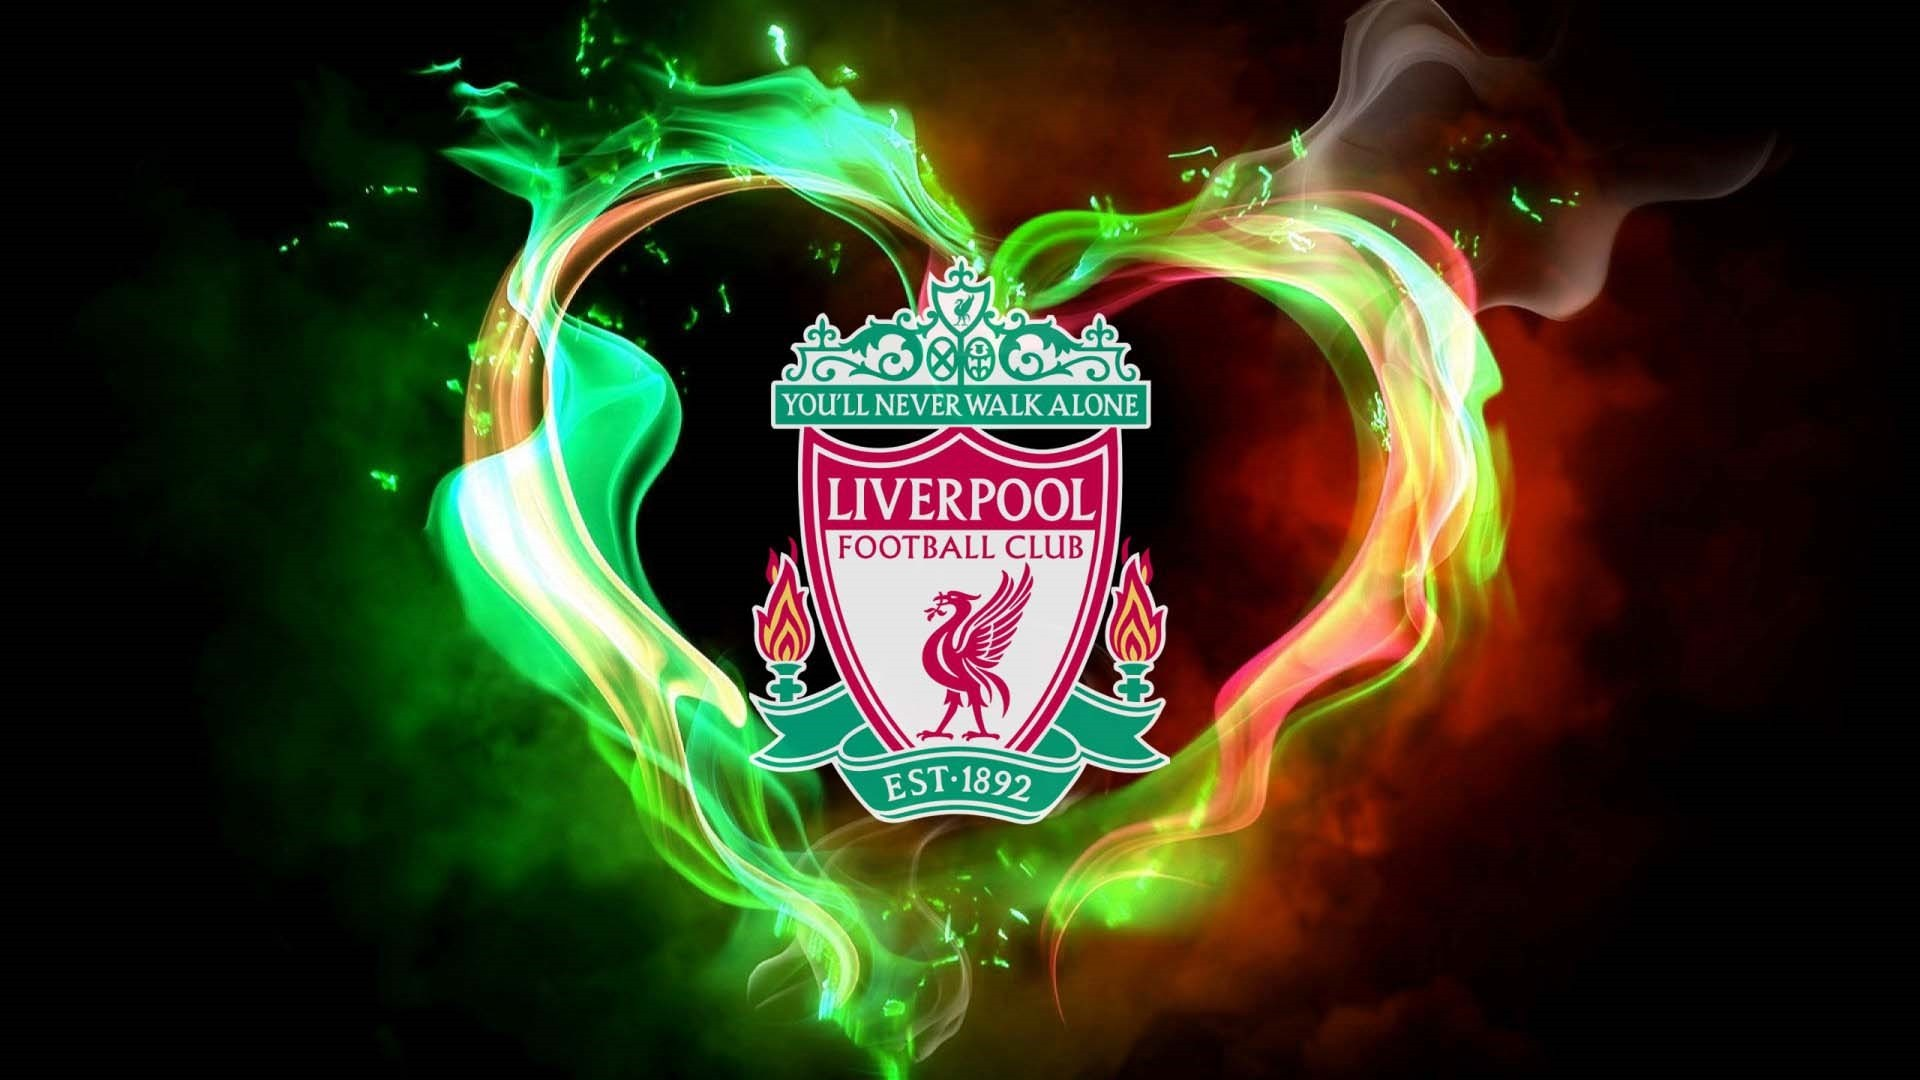 Liverpool hd wallpaper download